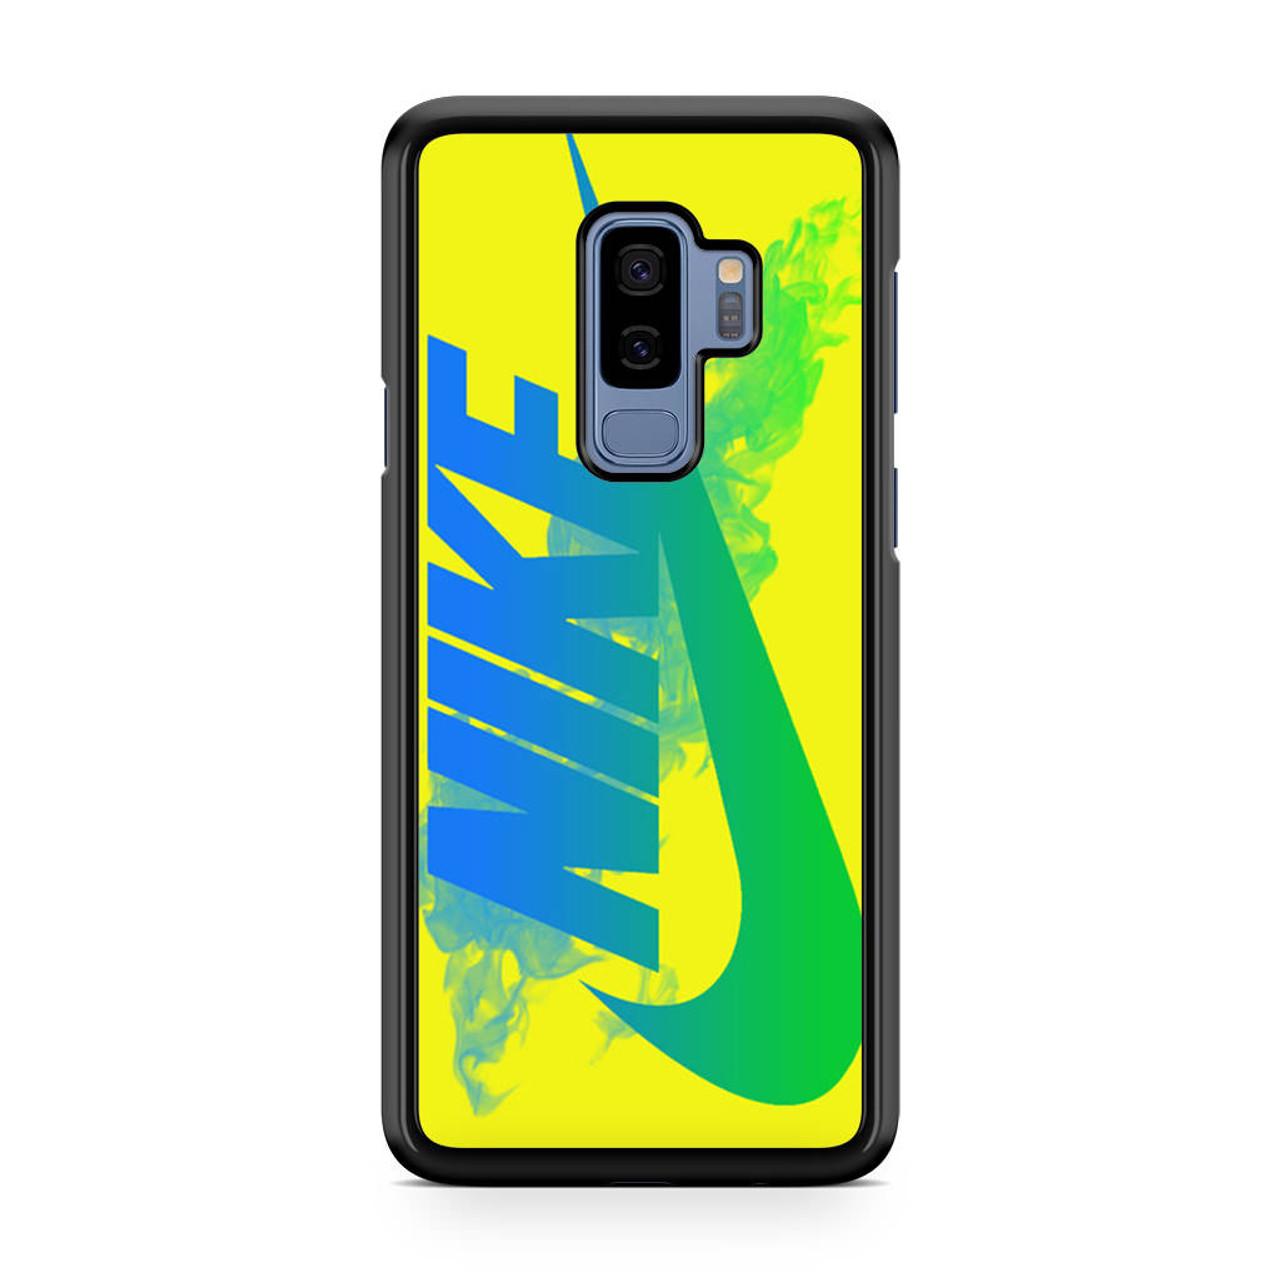 samsung s9 plus case yellow